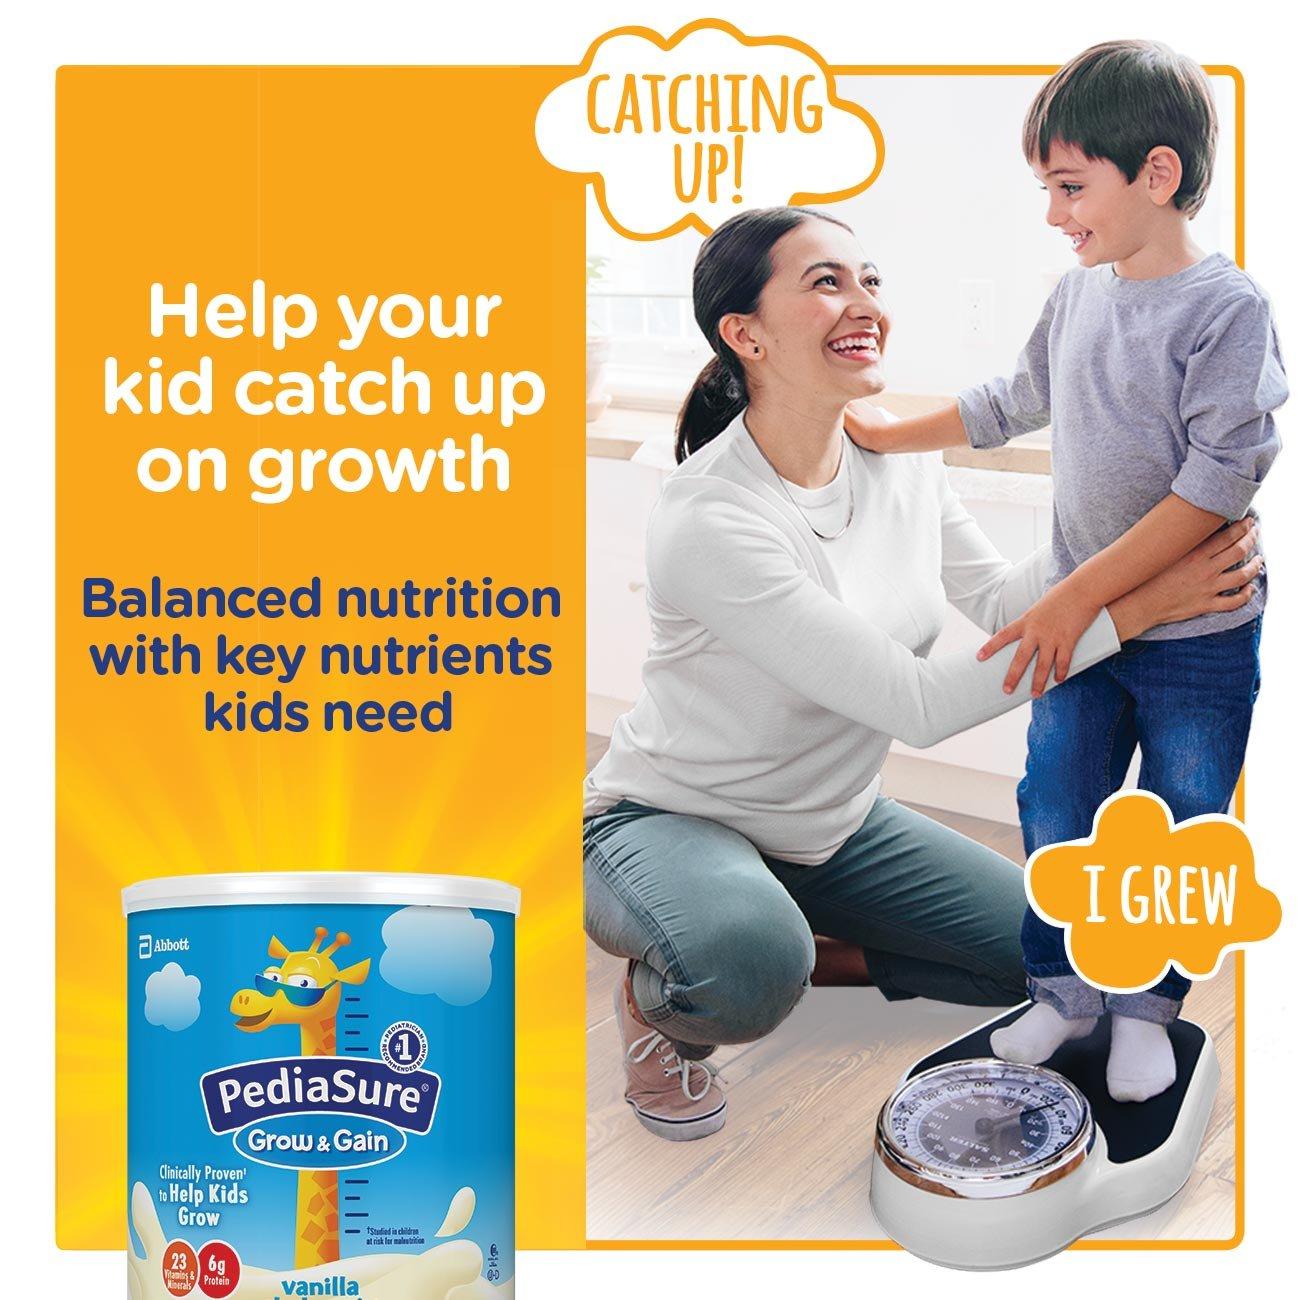 PediaSure Grow & Gain Non-GMO Vanilla Shake Mix Powder, Nutrition Shake for Kids, 14.1 oz, 3 Count by Pediasure (Image #3)